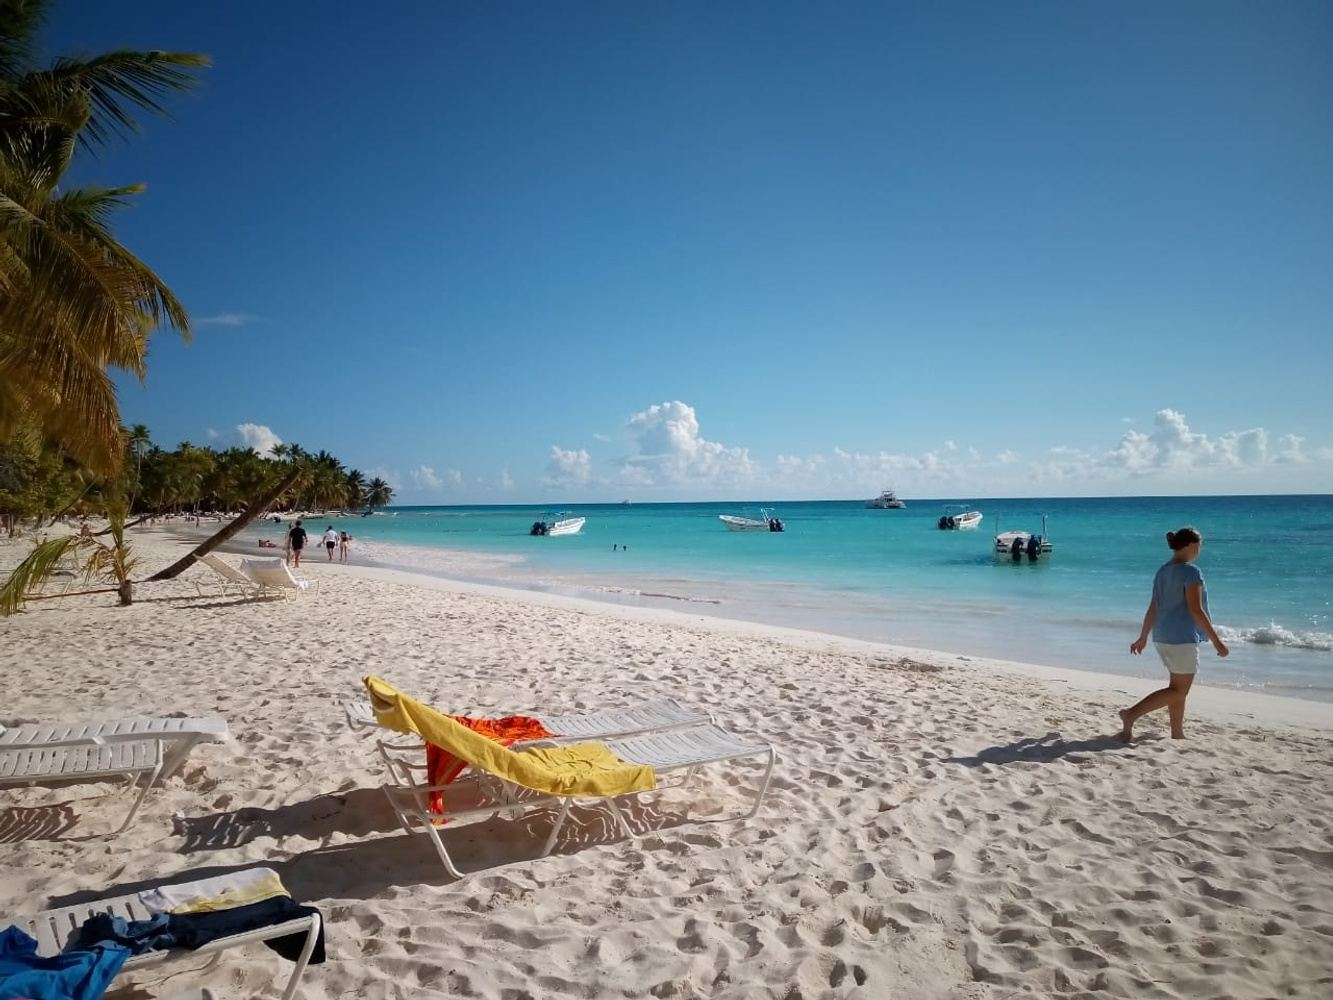 Saona Canto de la Playa